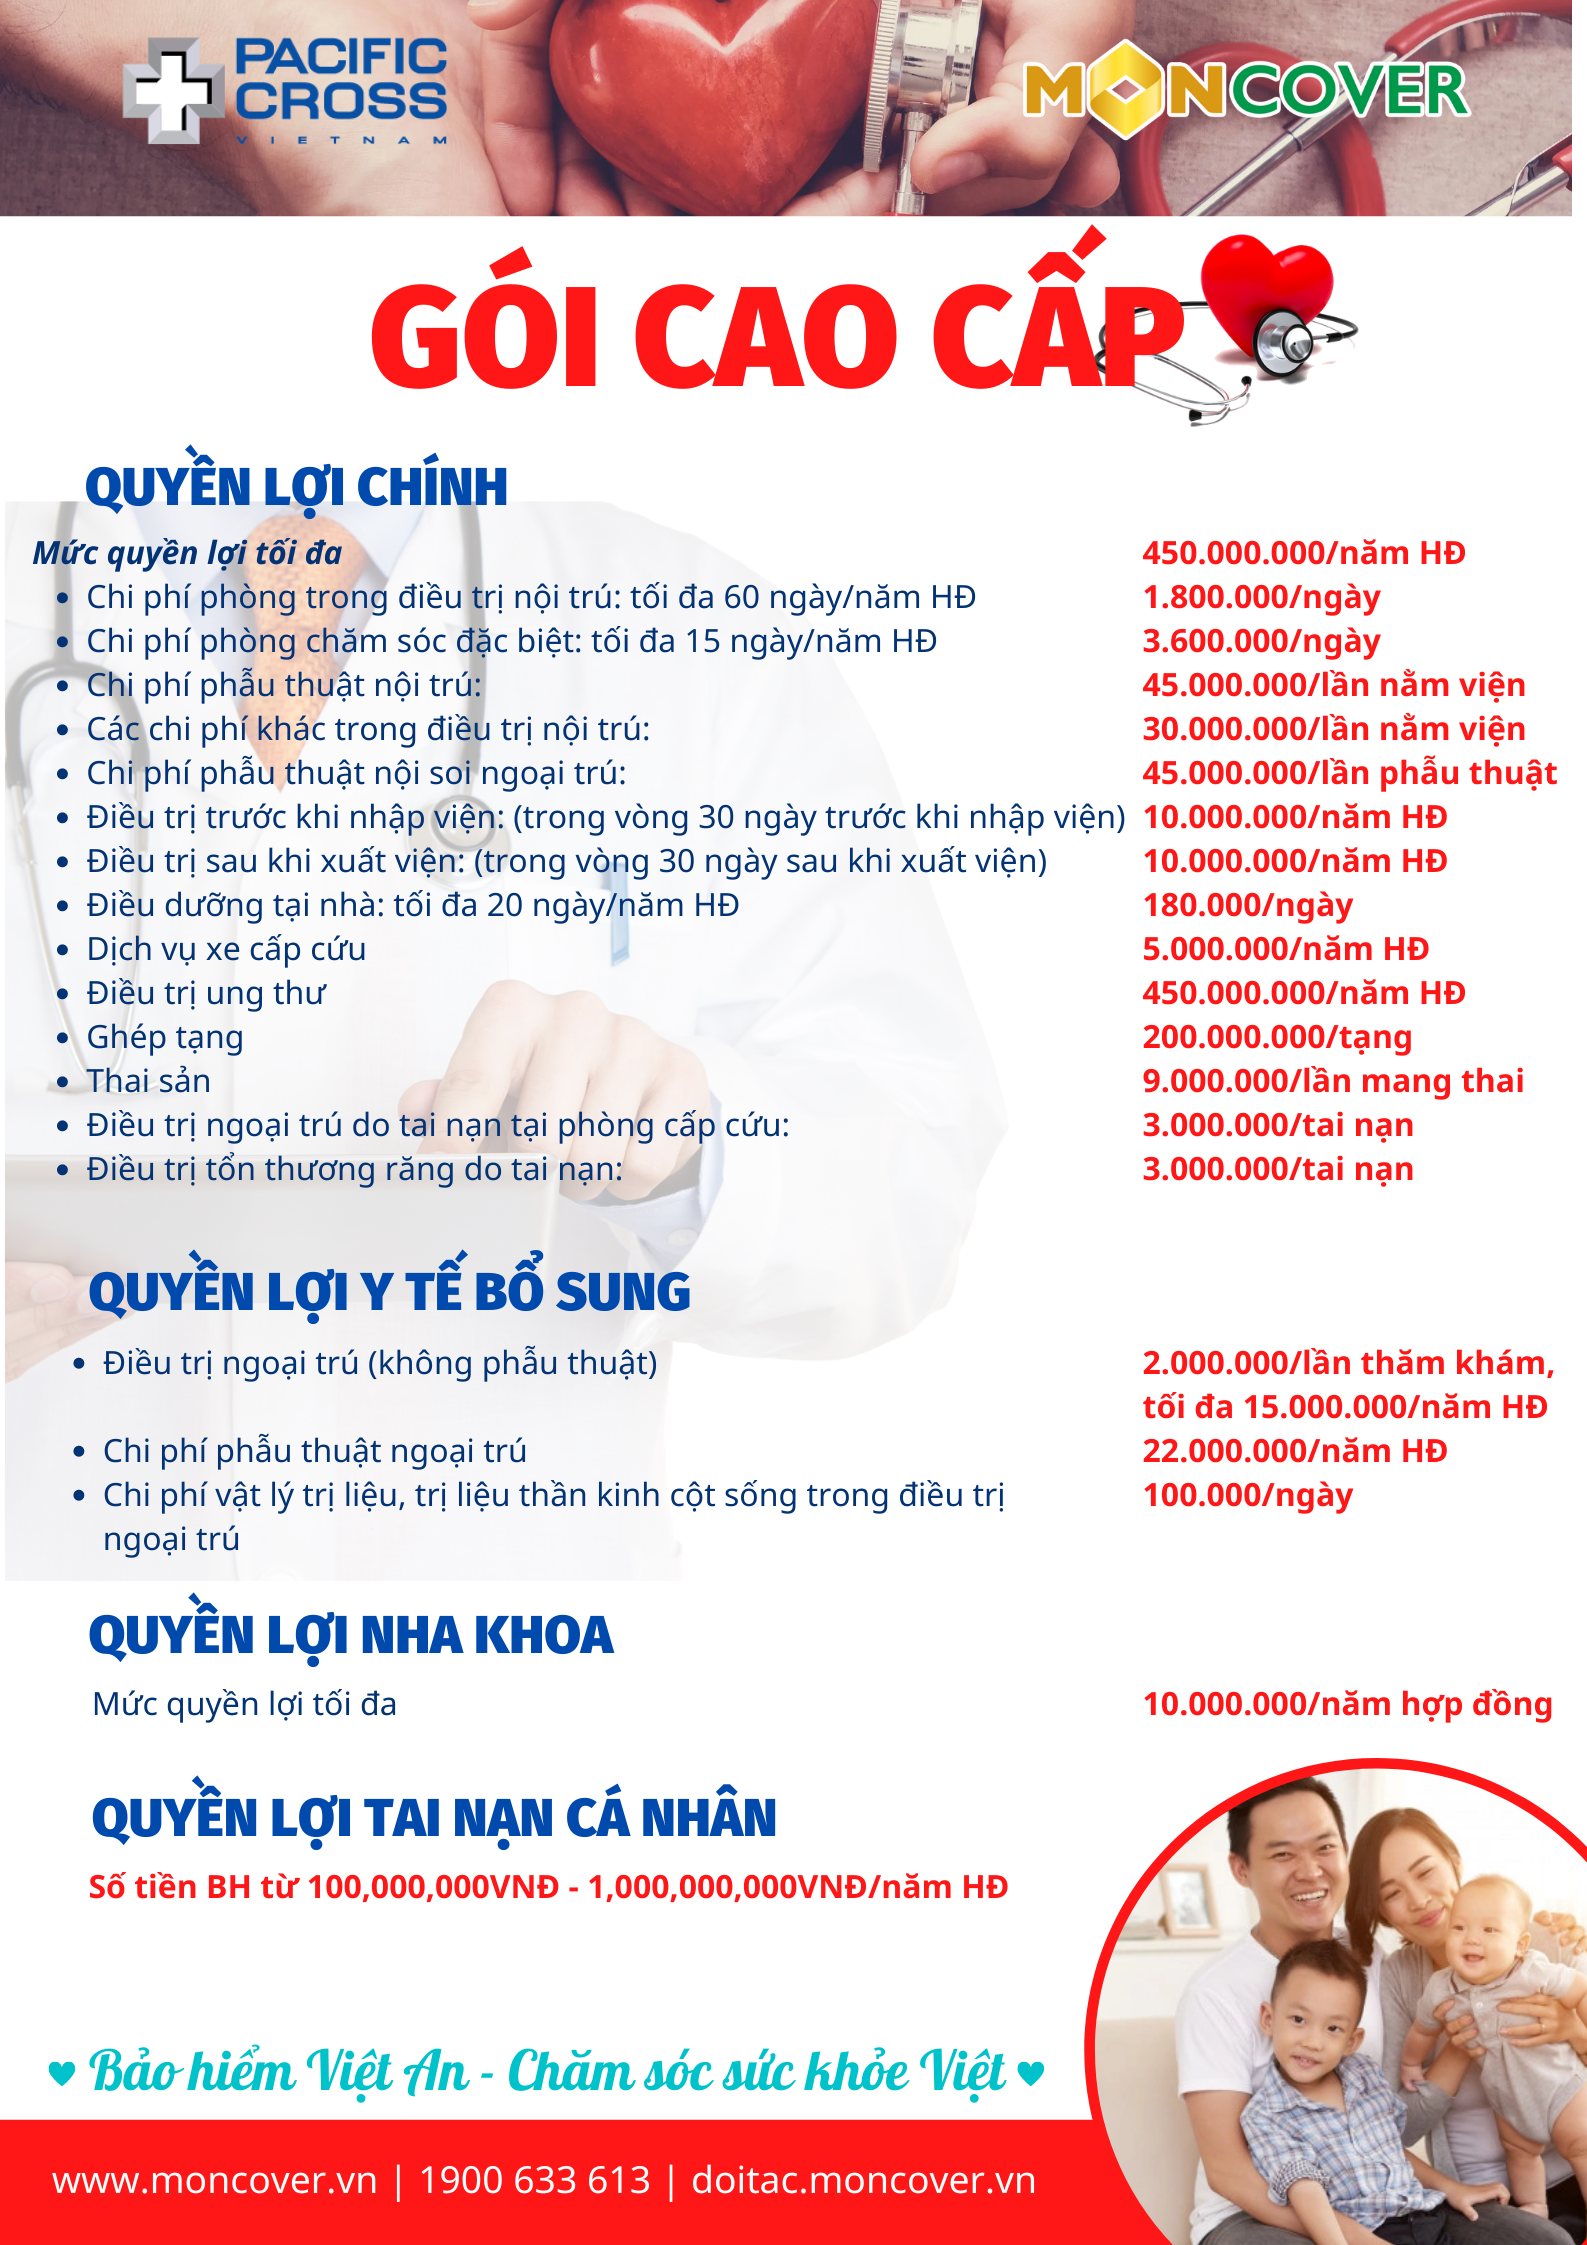 Bảo hiểm sức khỏe Việt An